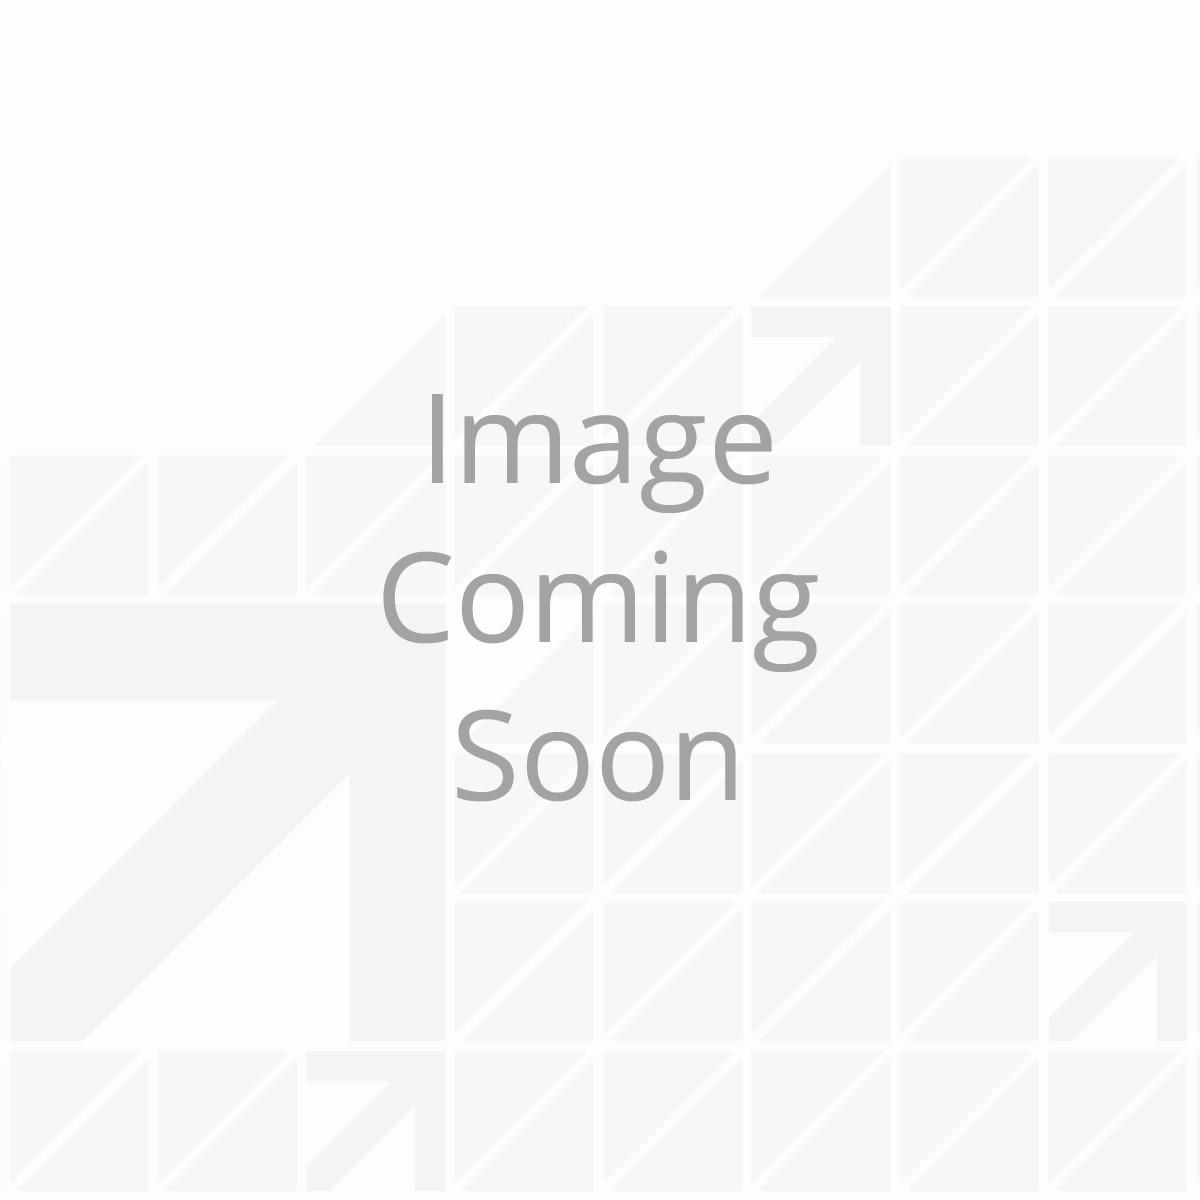 Sundeck Kit (5 Yards Vinyl) - Various Colors